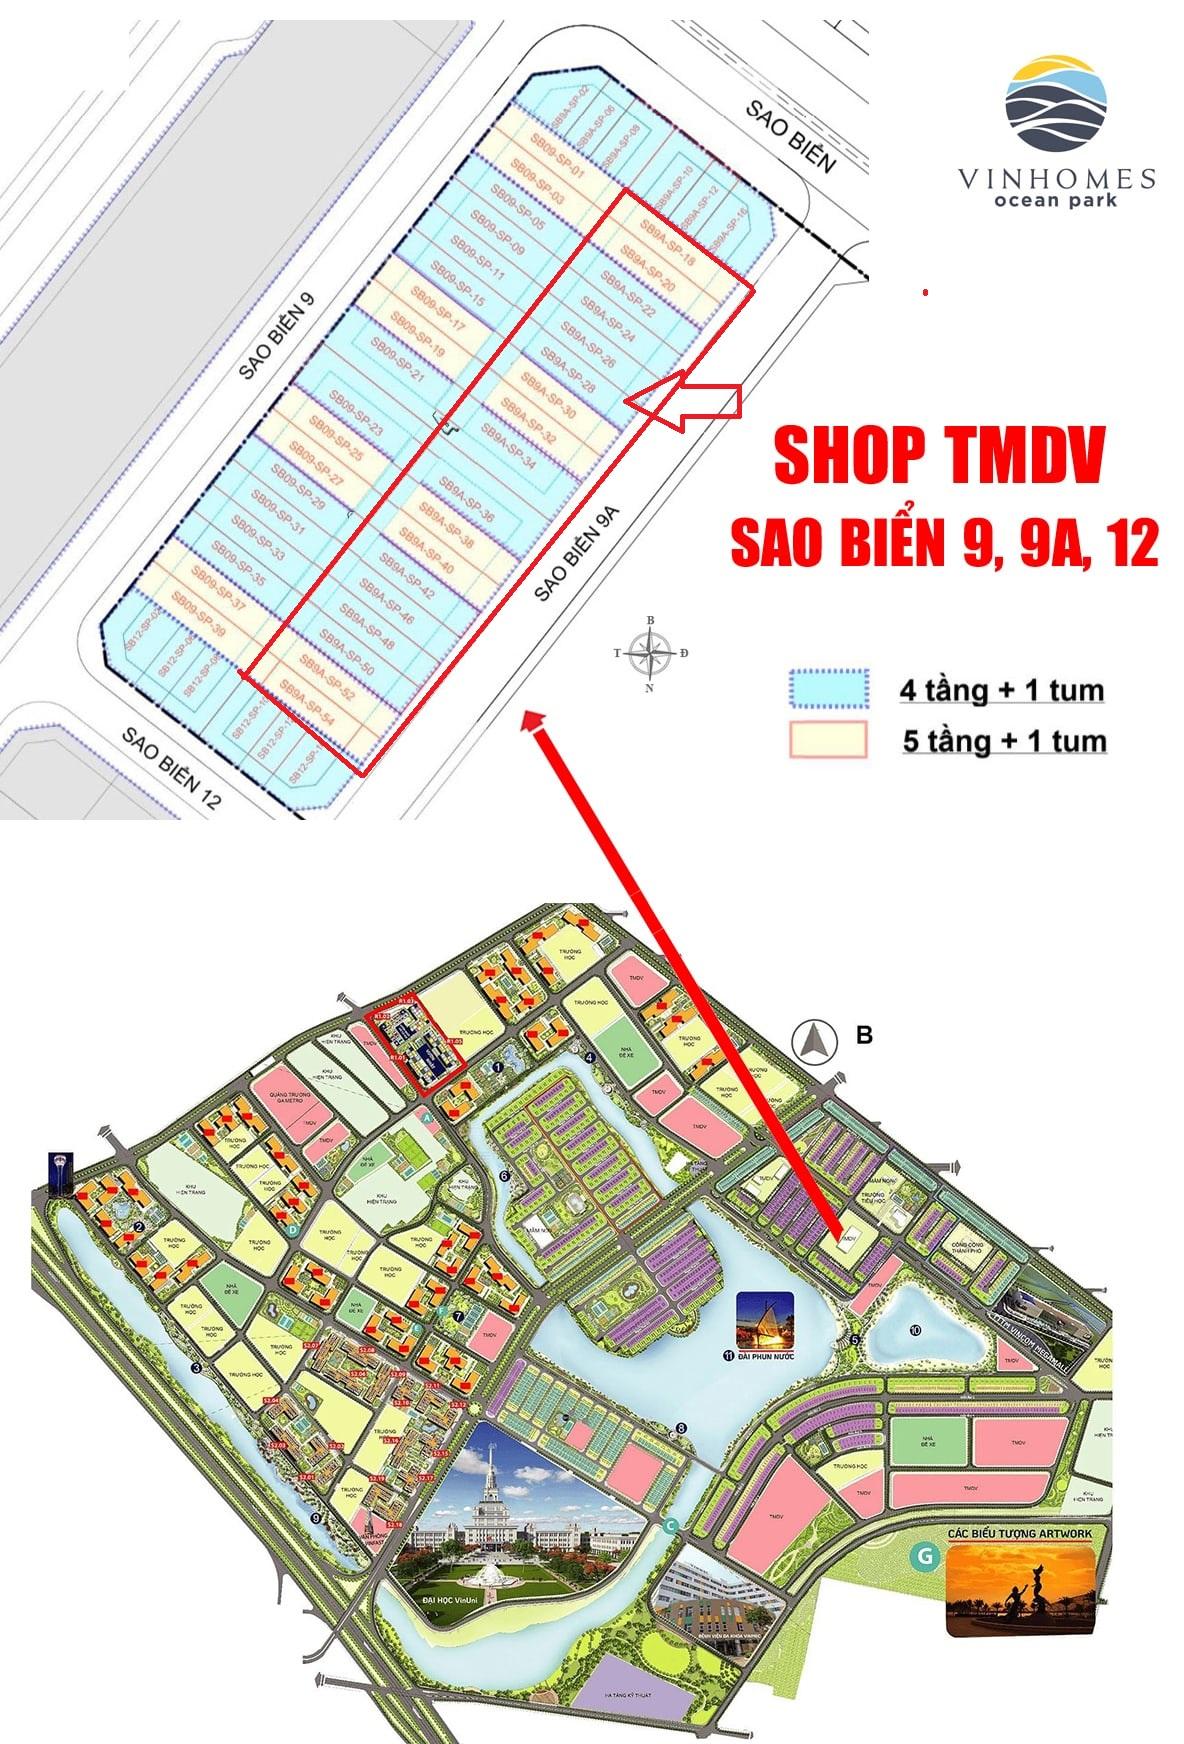 ban-shophouse-sao-bien-9a-shop-tmdv-sao-bien-9a